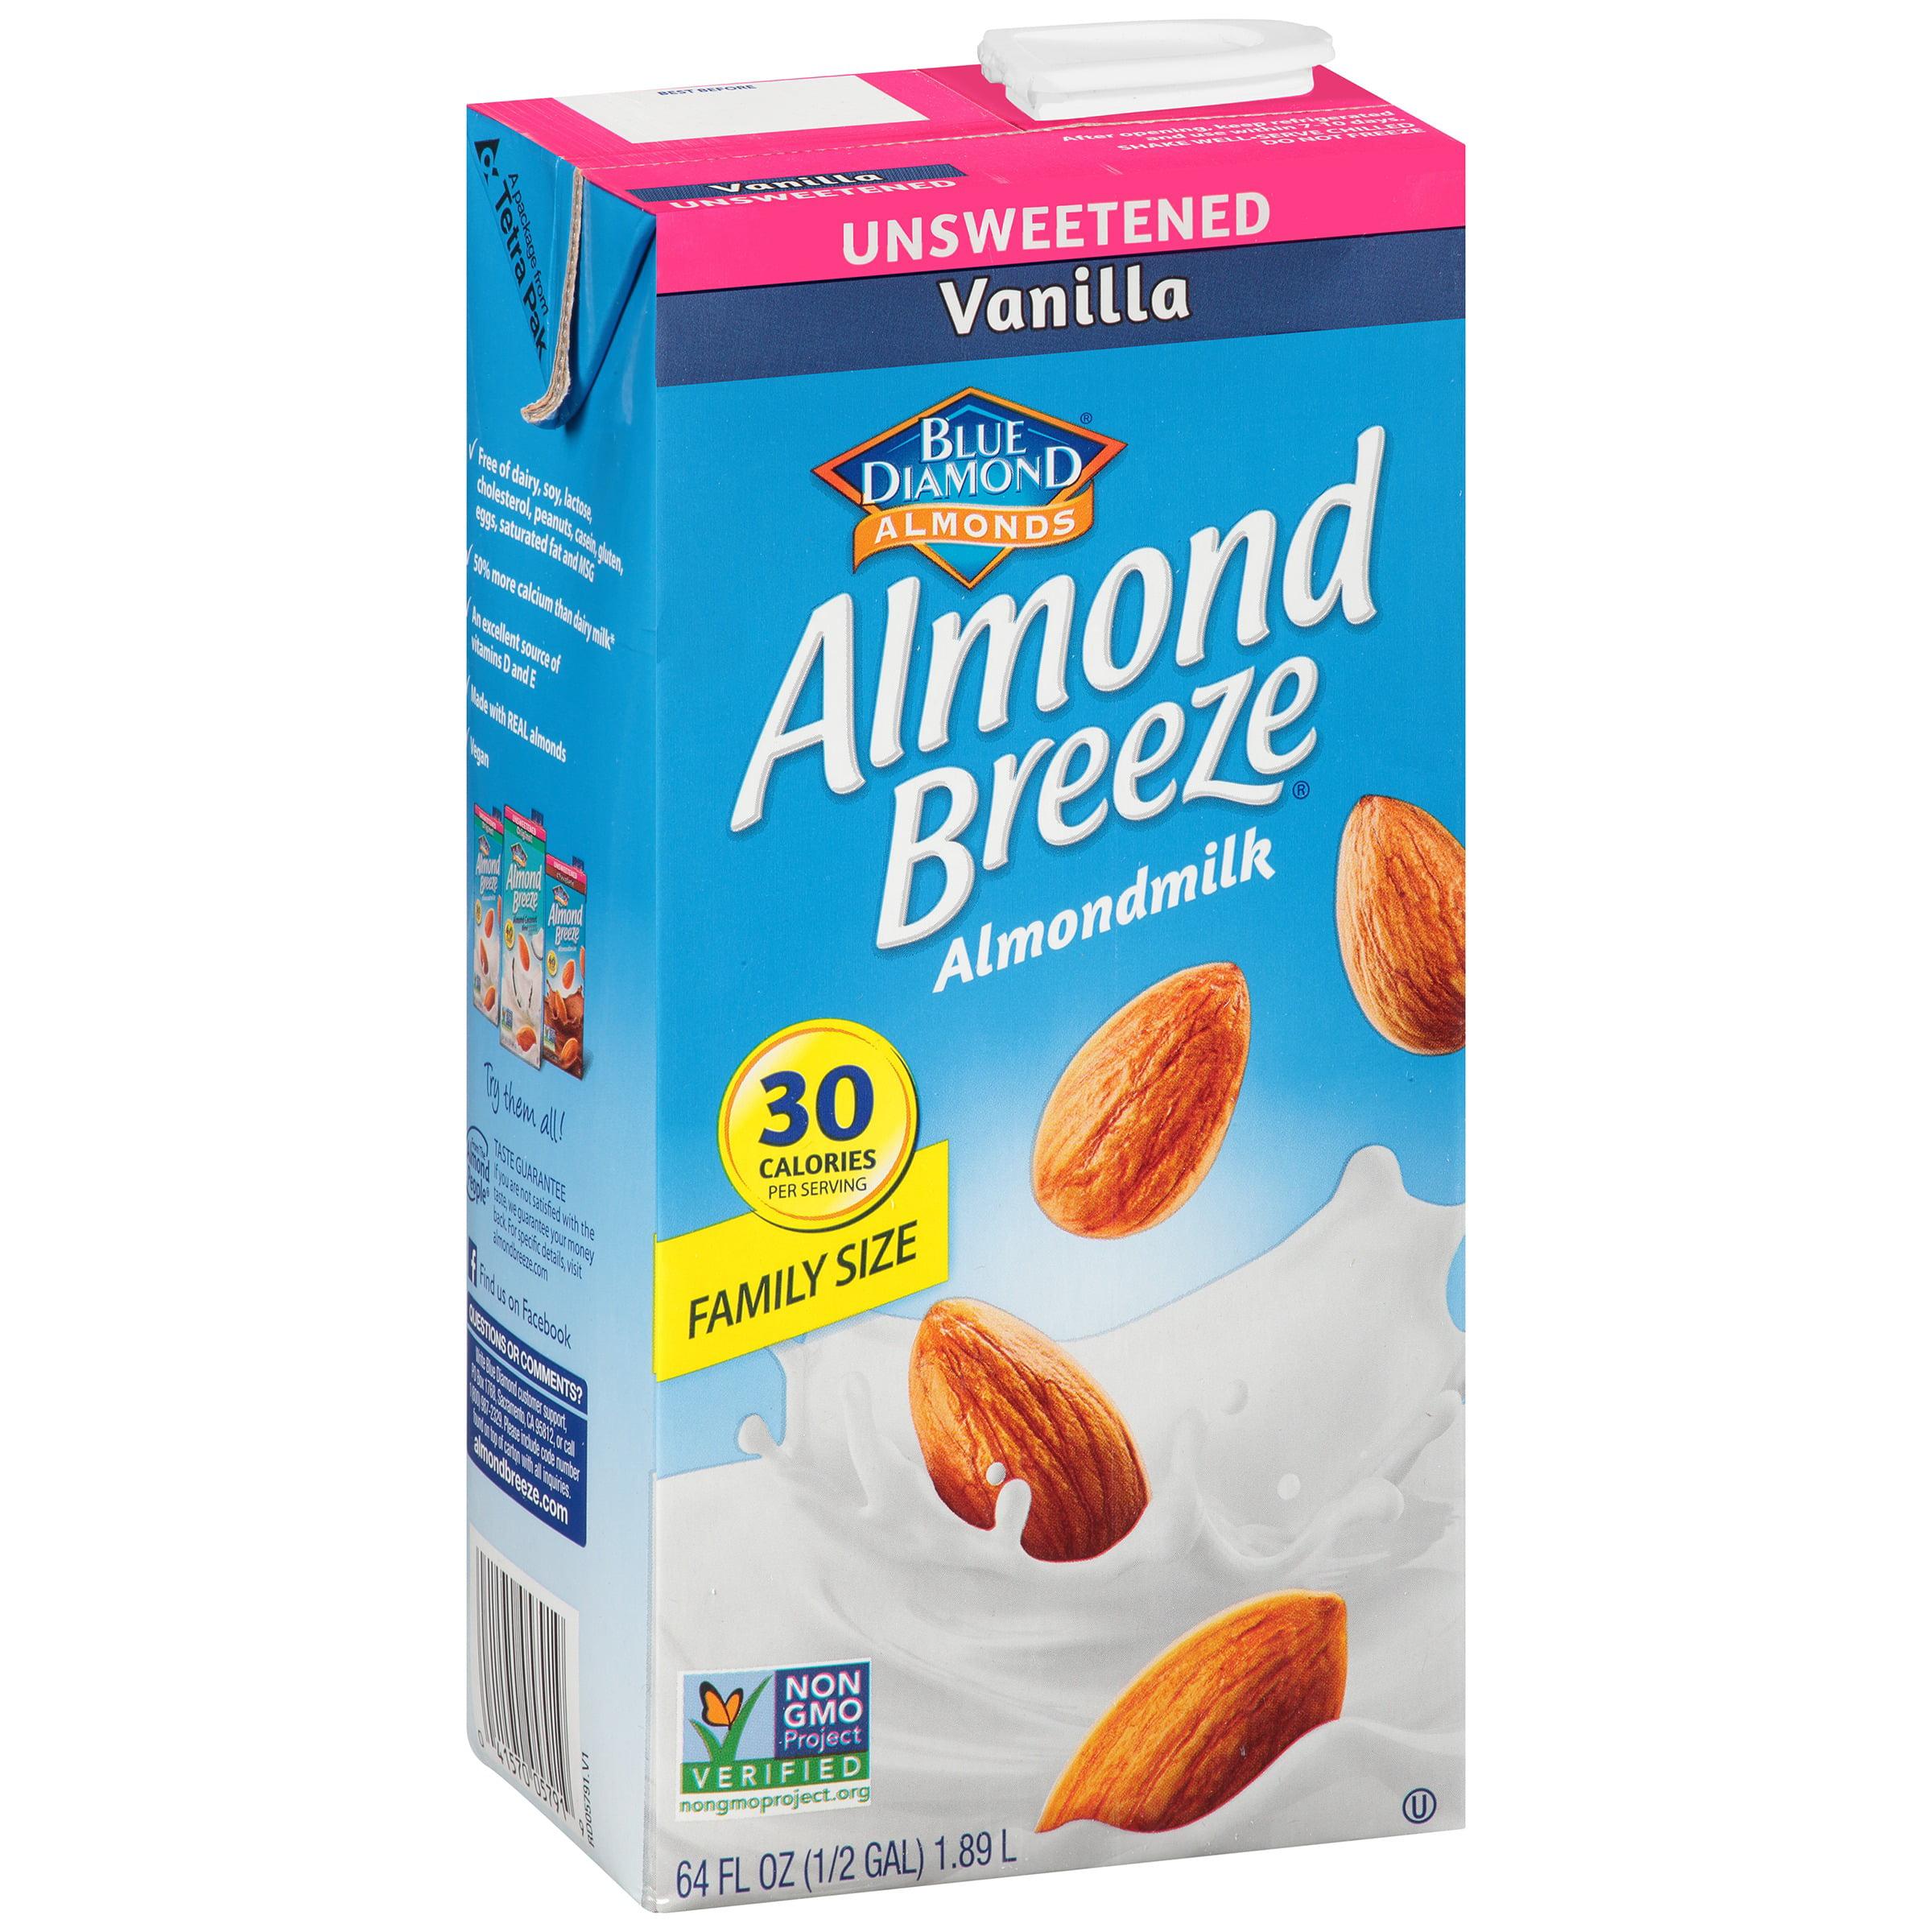 Blue Diamond Almond Breeze Vanilla Almondmilk, 64 fl oz